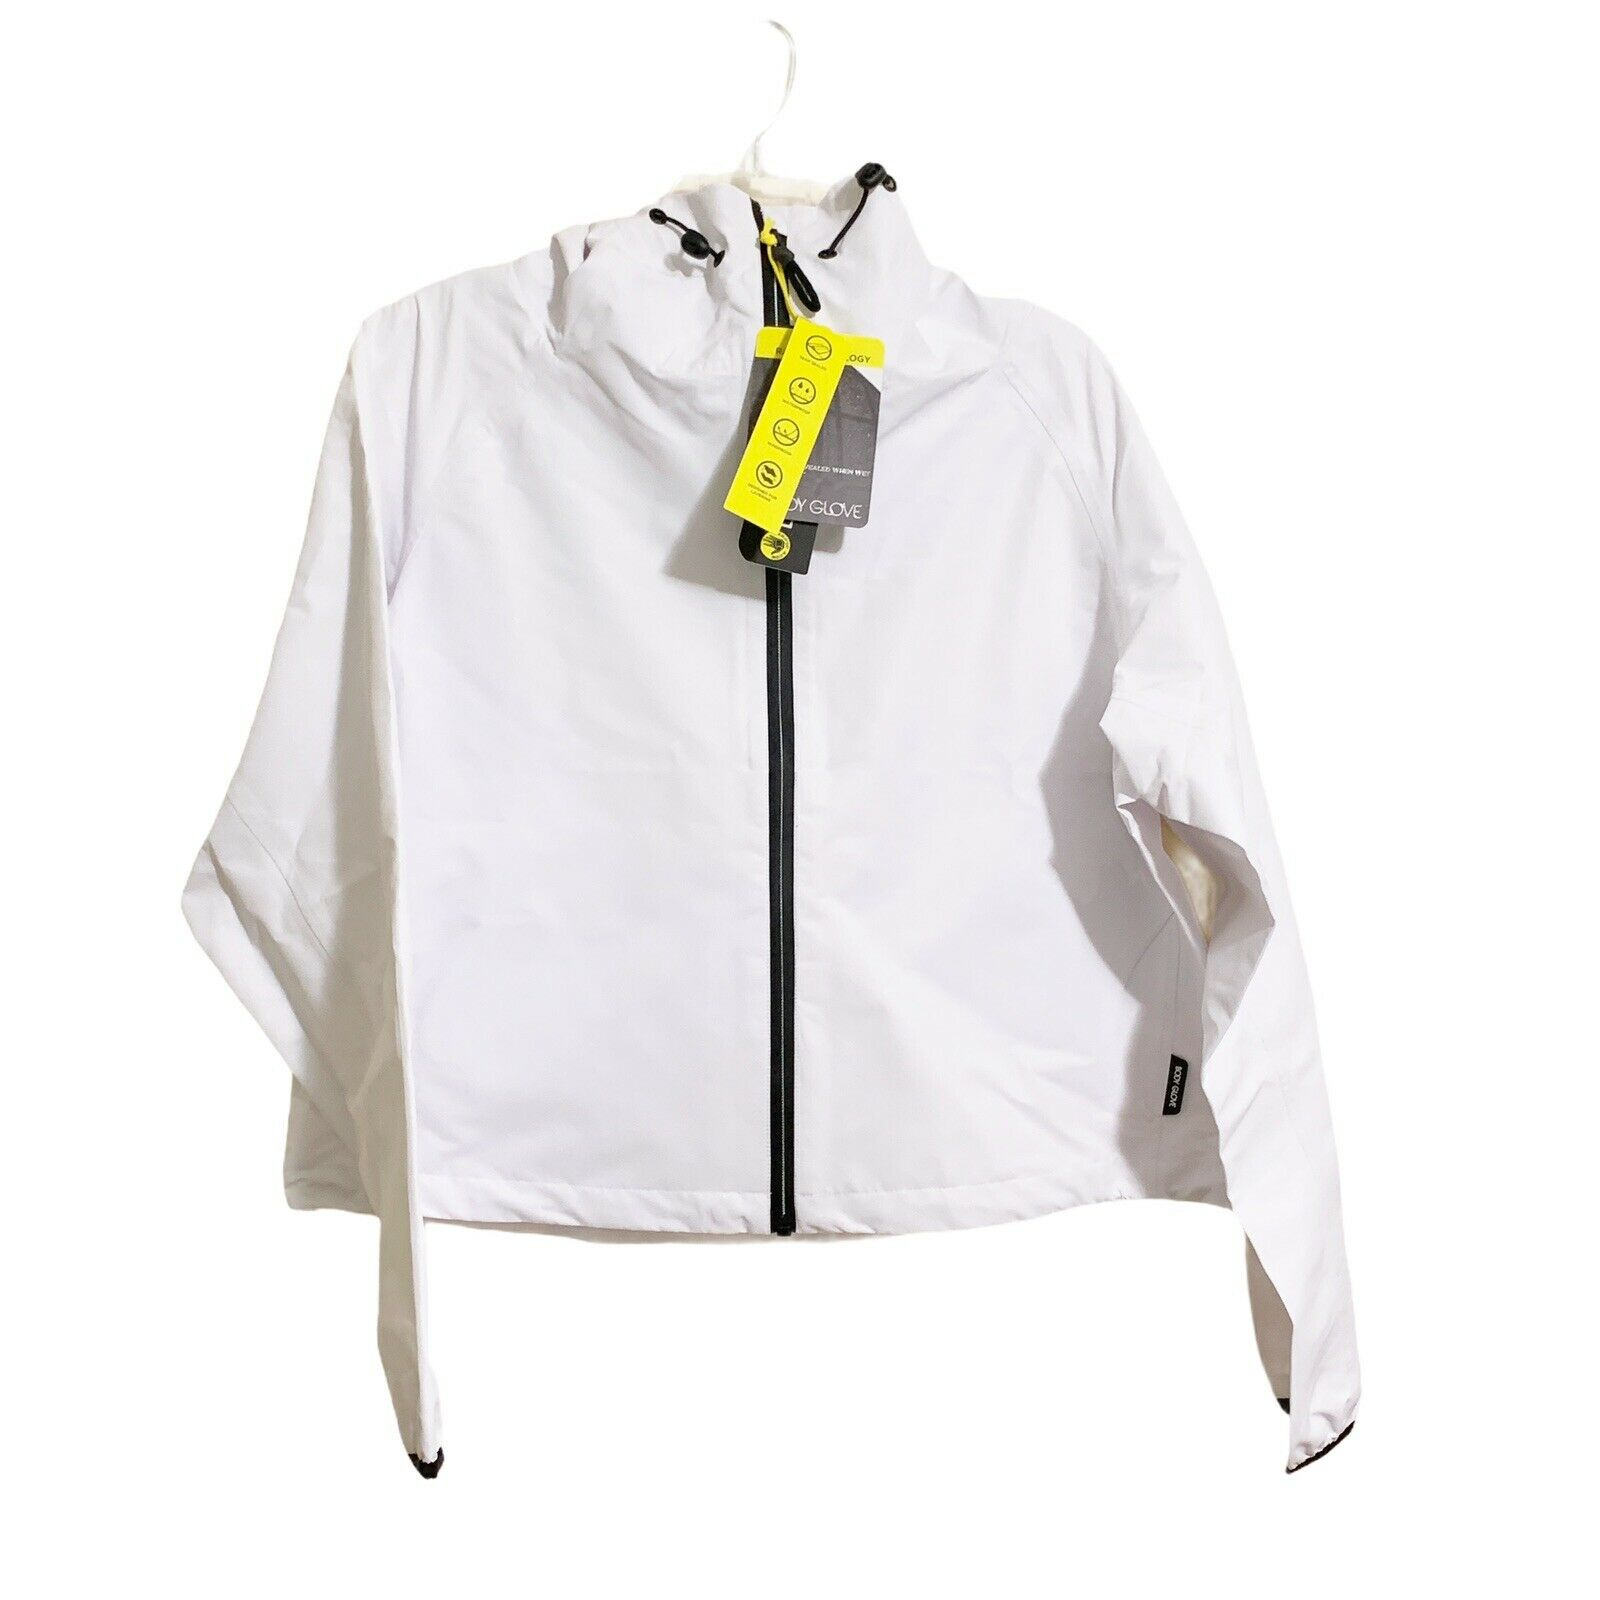 Body Glove Cropped Rain Jacket Front Zip White Size Large Waterproof